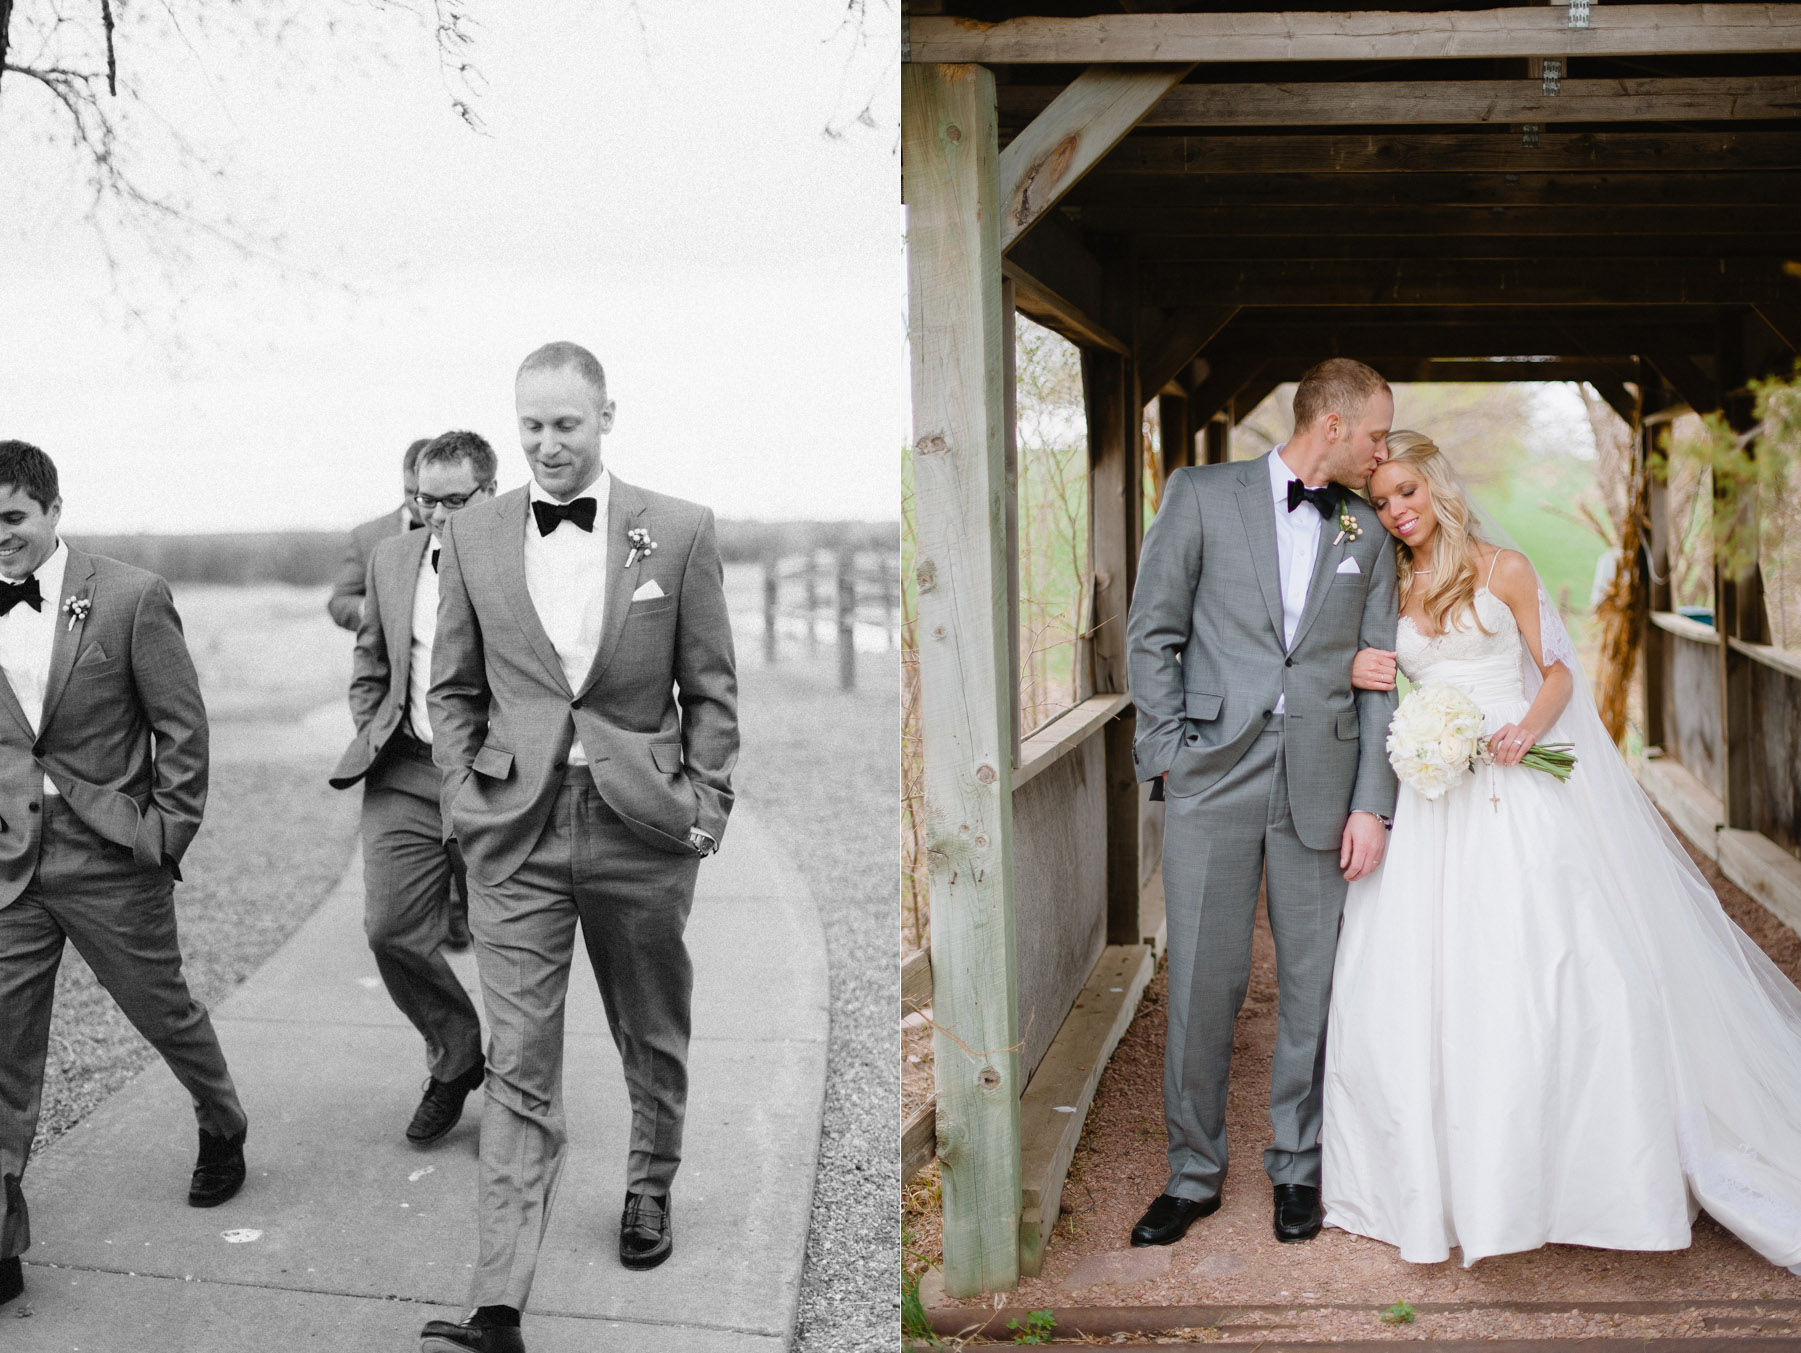 Liz-and-Lance-Wedding-17.jpg